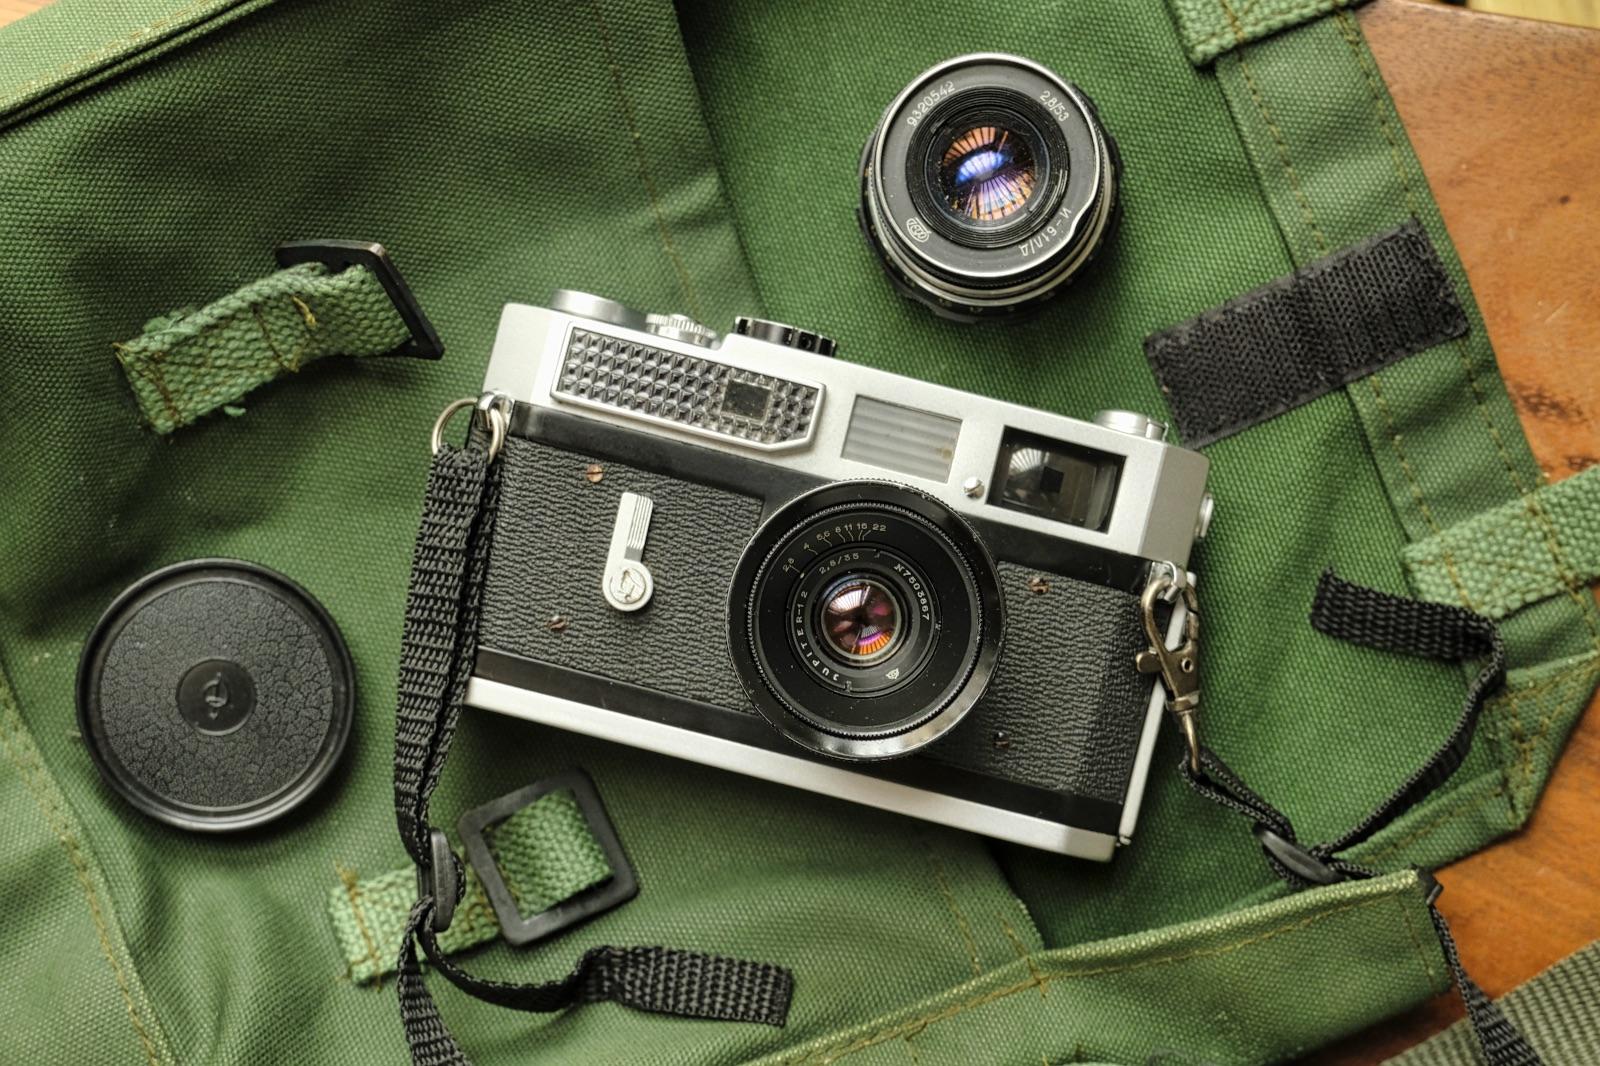 Canon 7 and lenses (Pic: Lester Ledesma)